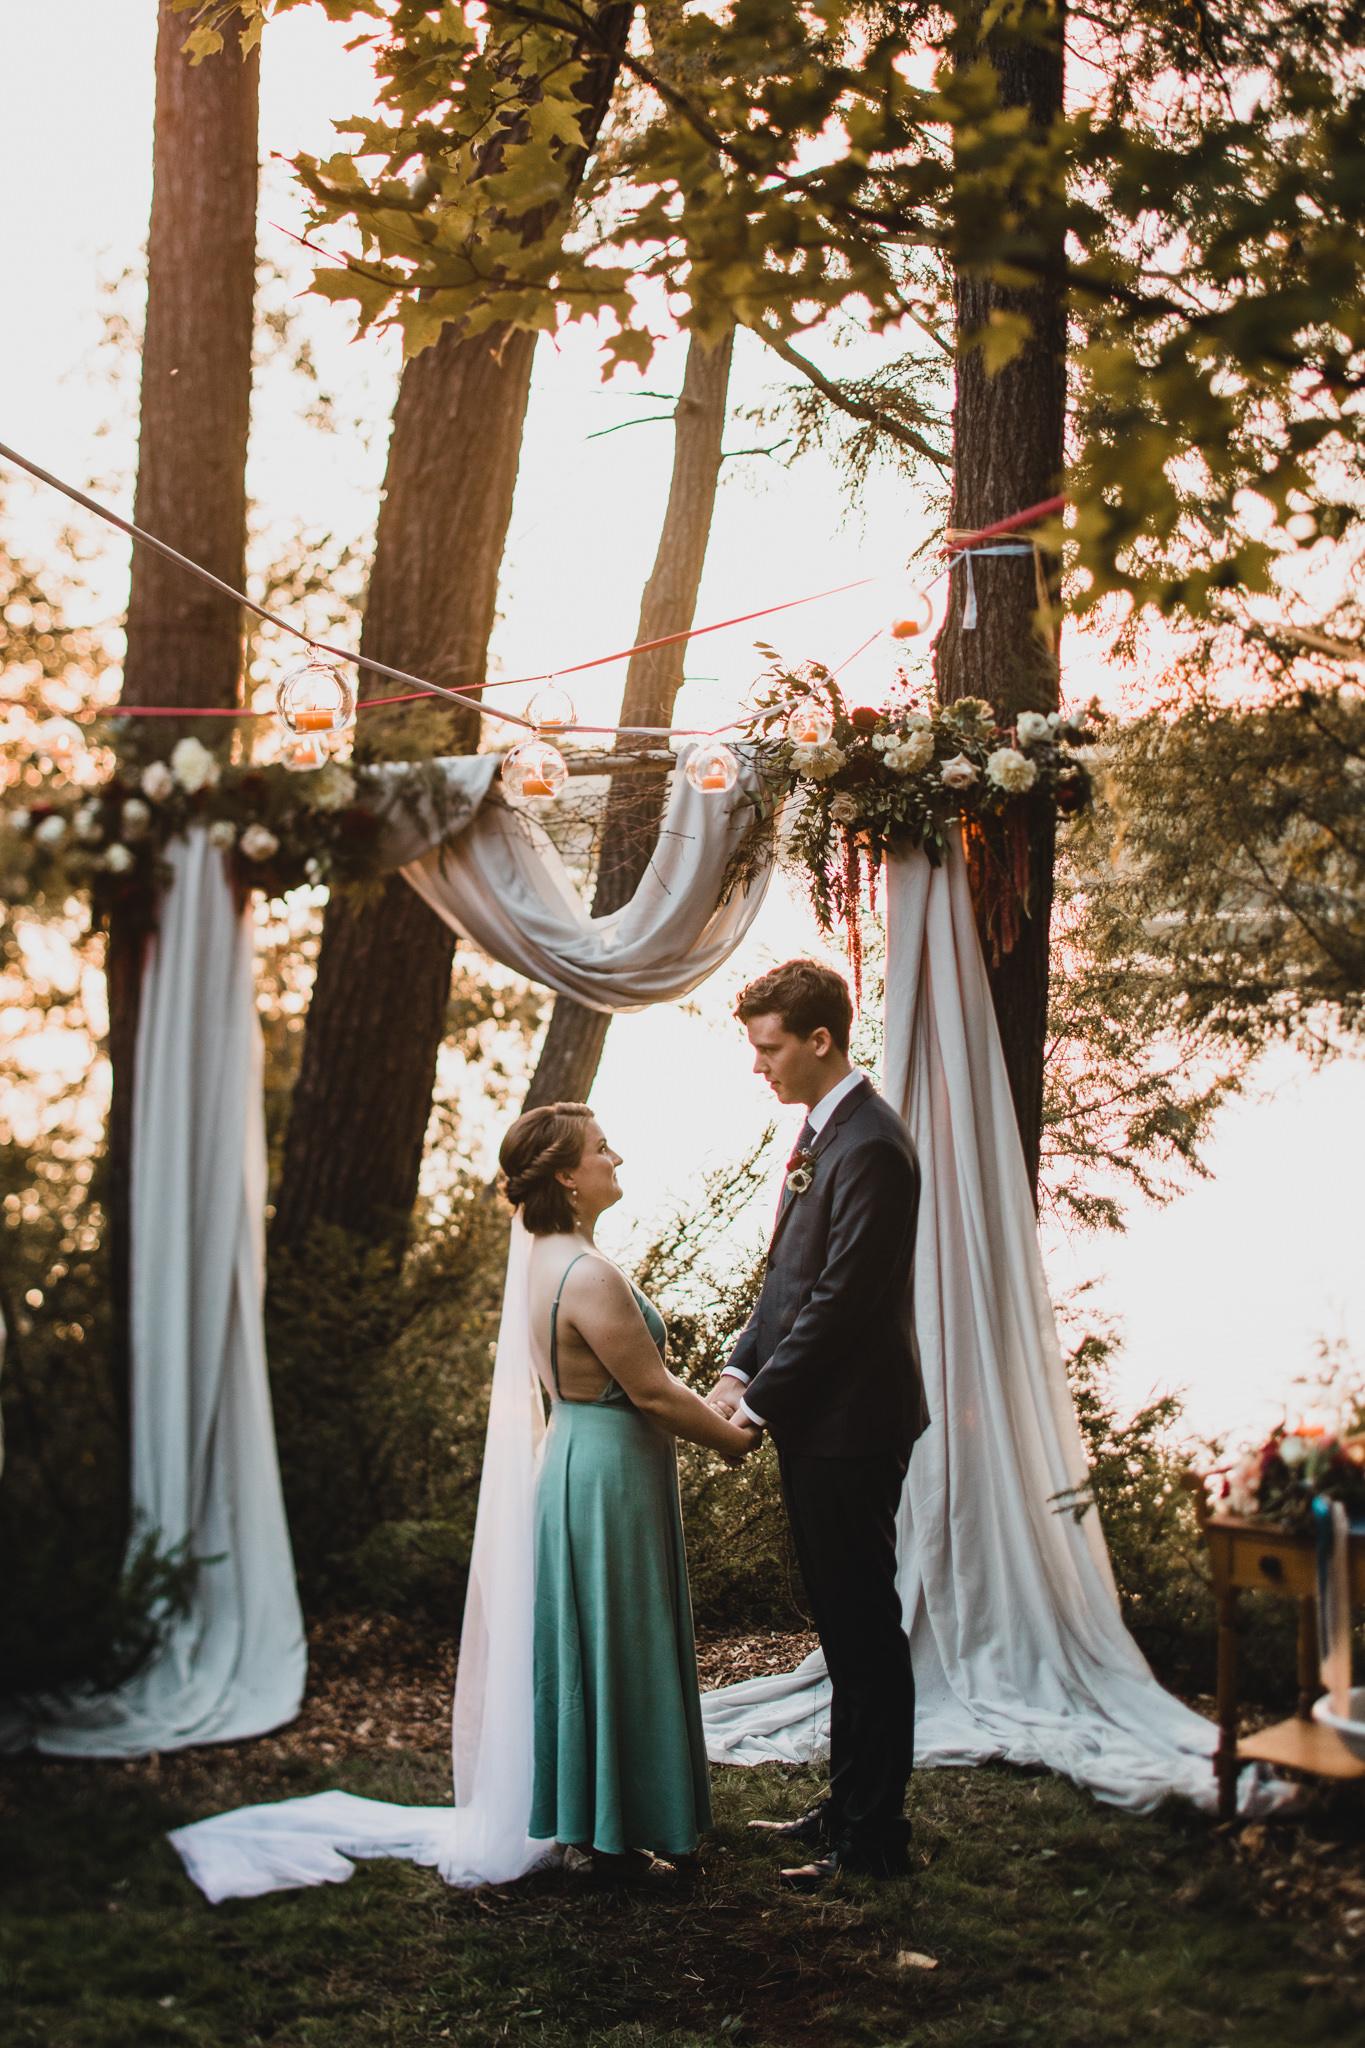 309-WEB-Jonathan-Kuhn-Photography-Taylor-Noah-Wedding-1450.jpg